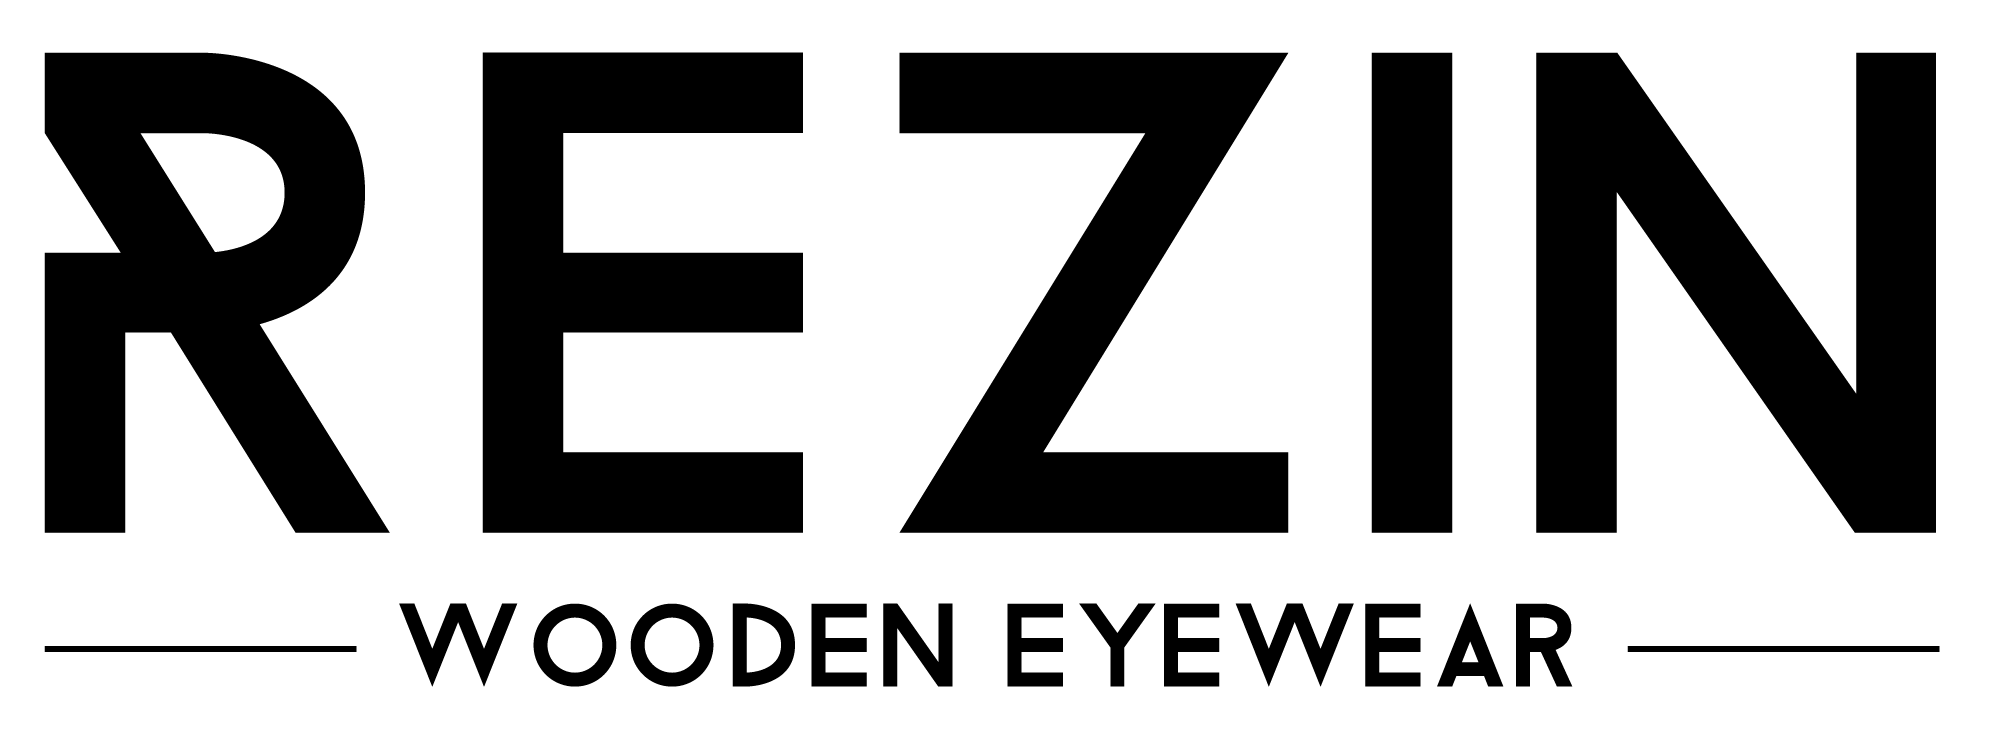 rezin_logo_2x